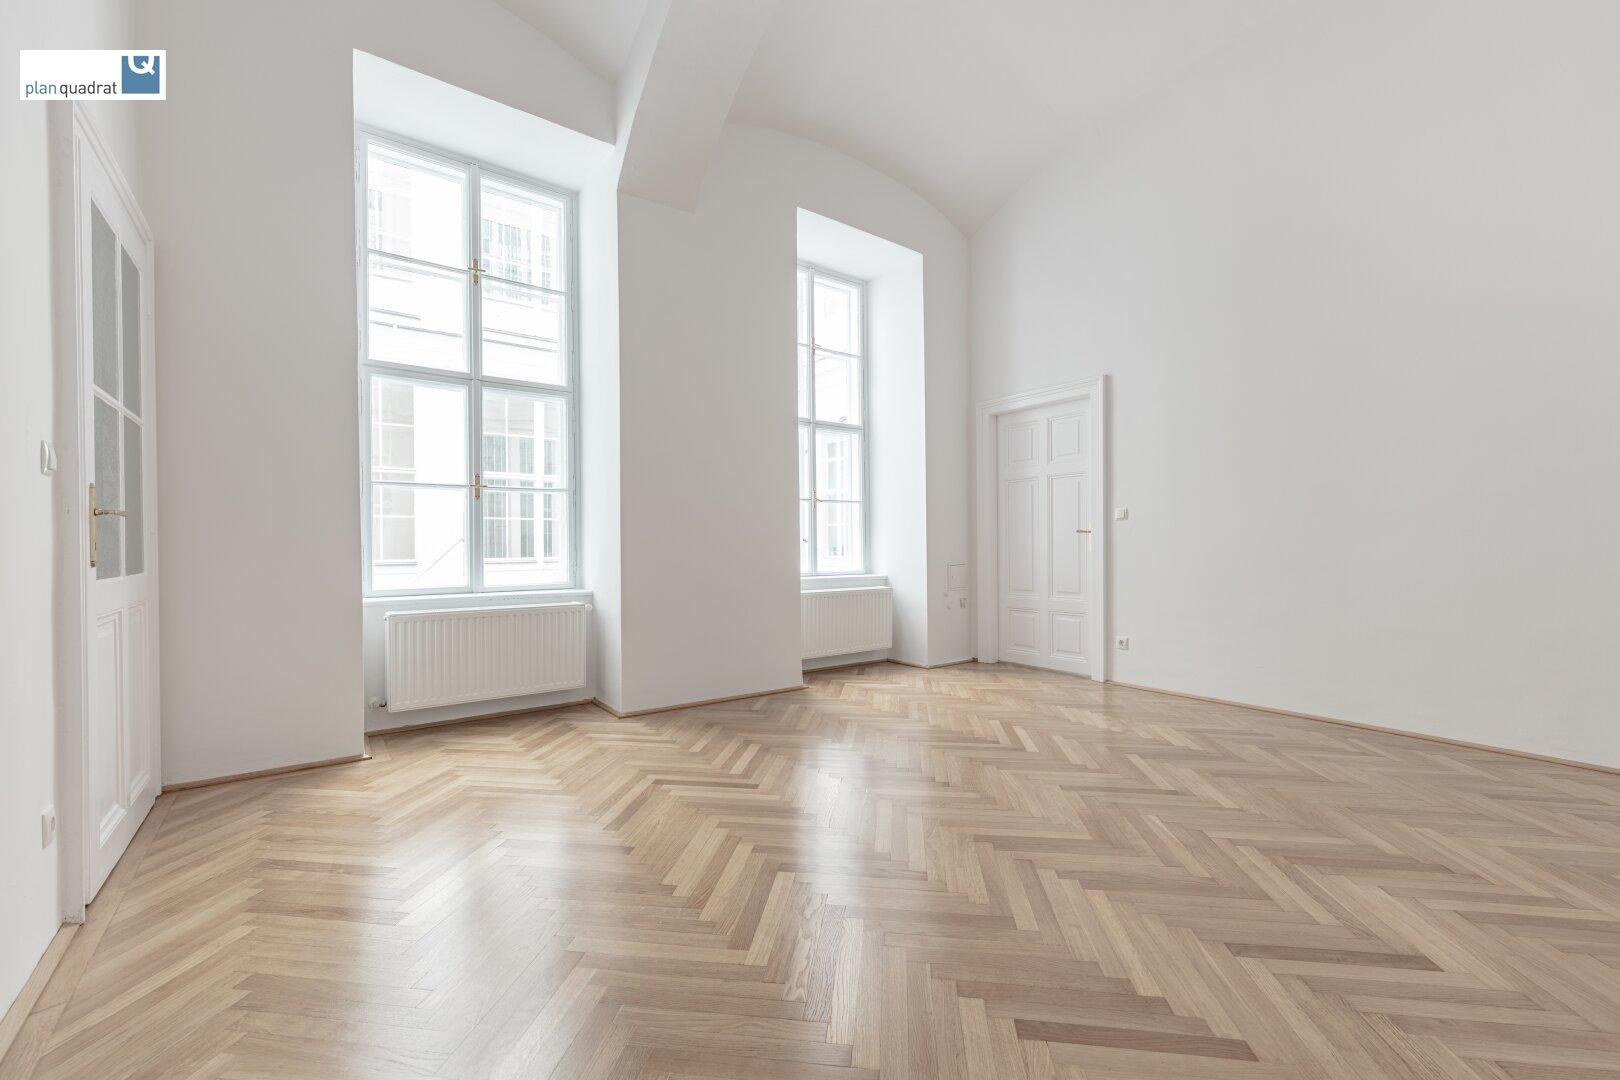 Zimmer 3 (ca. 21,20 m²) gem. Grundriss